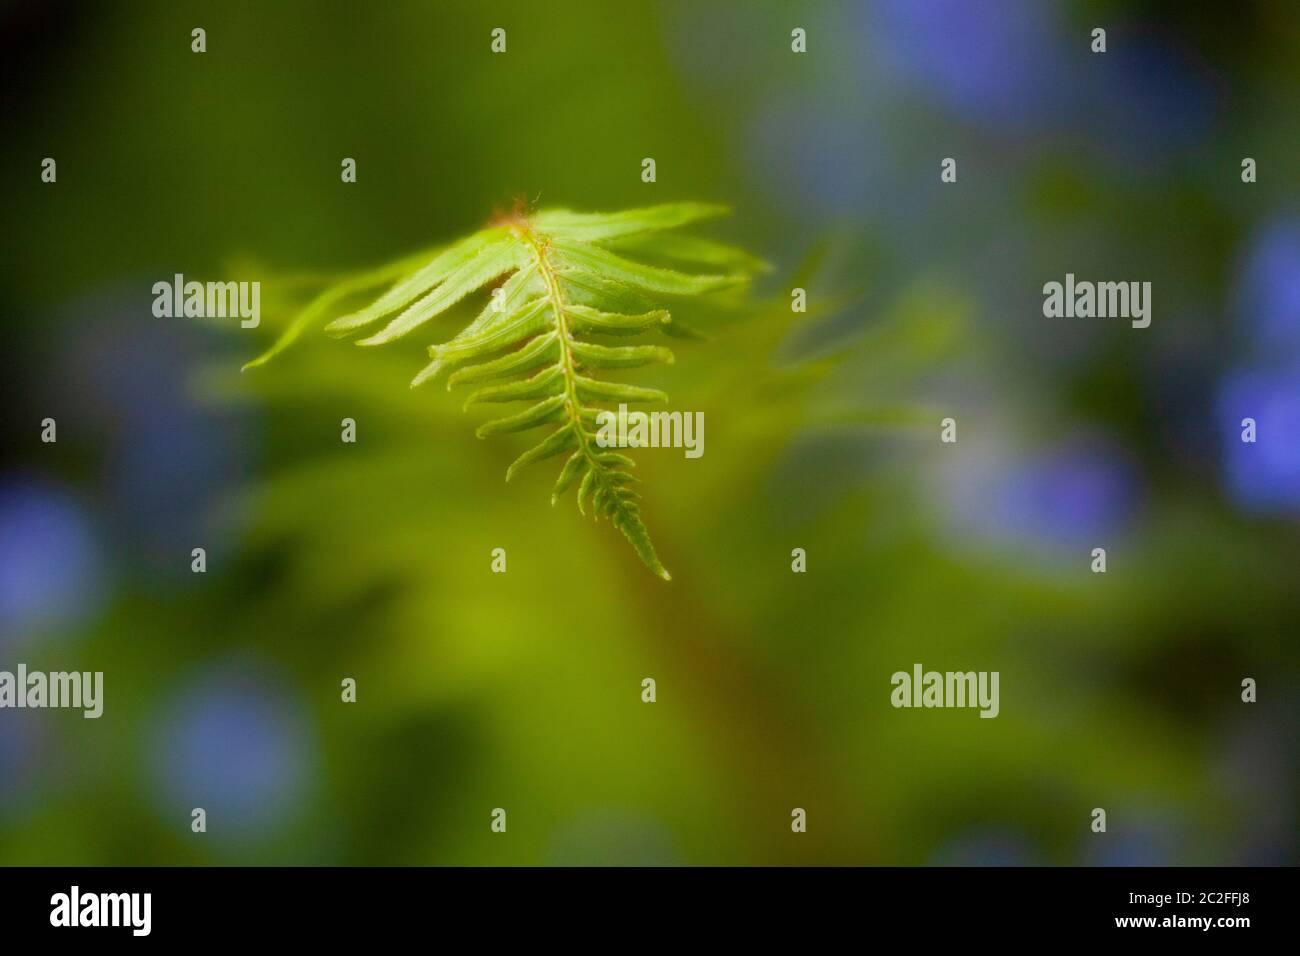 LB00215-00.....WASHINGTON - Fern in giardino urbano. Immagine Lensbaby Edge 50. Foto Stock